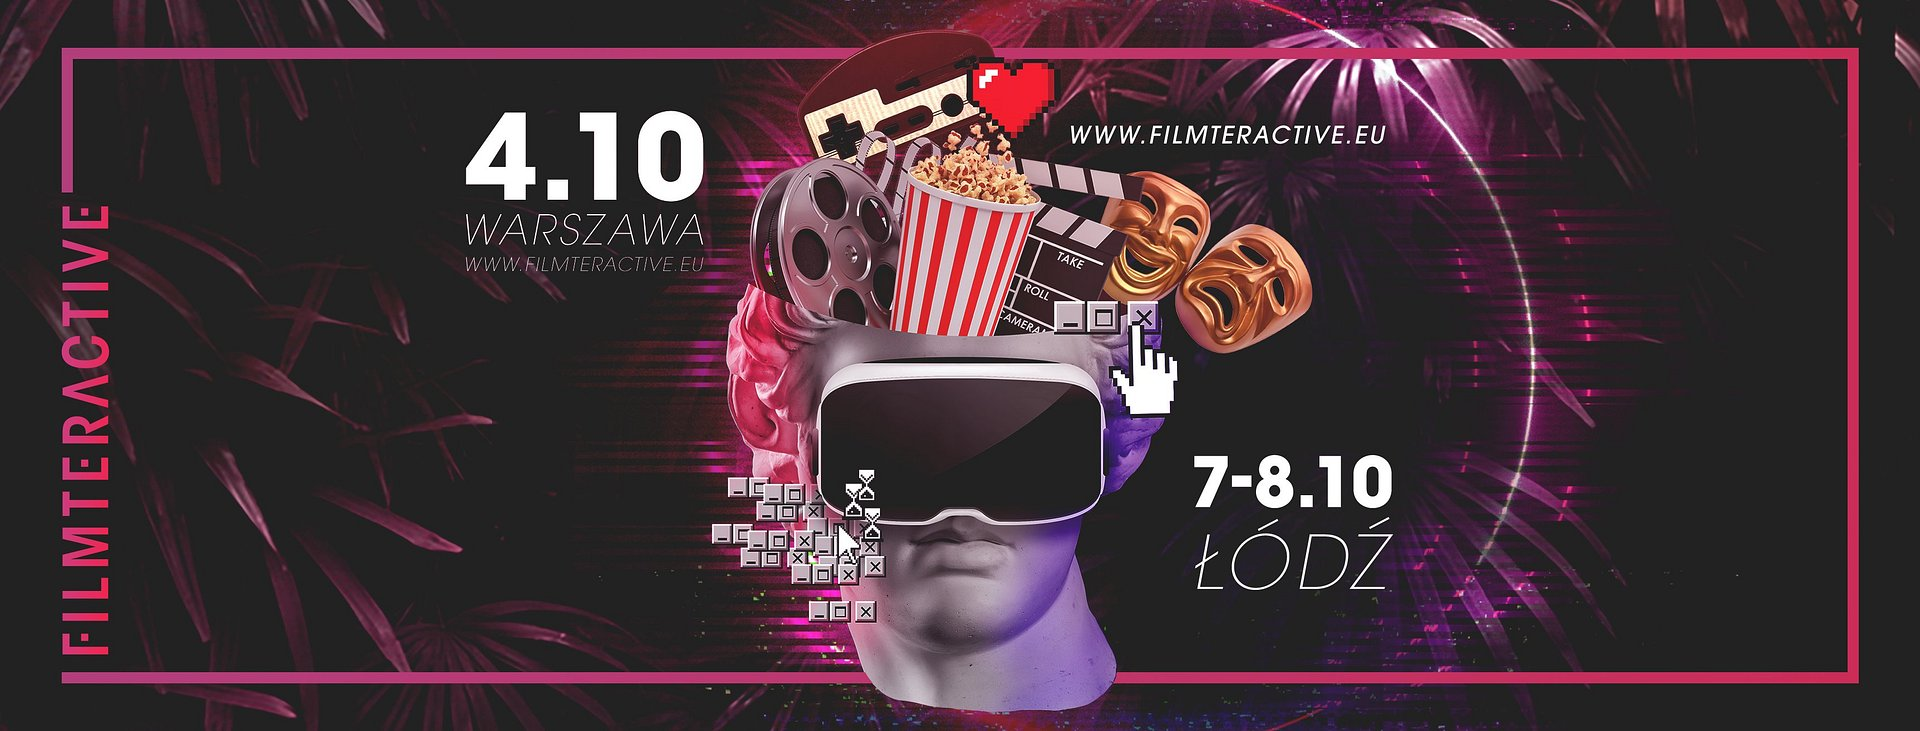 Kolejna edycja Filmteractive 2019 już niebawem!